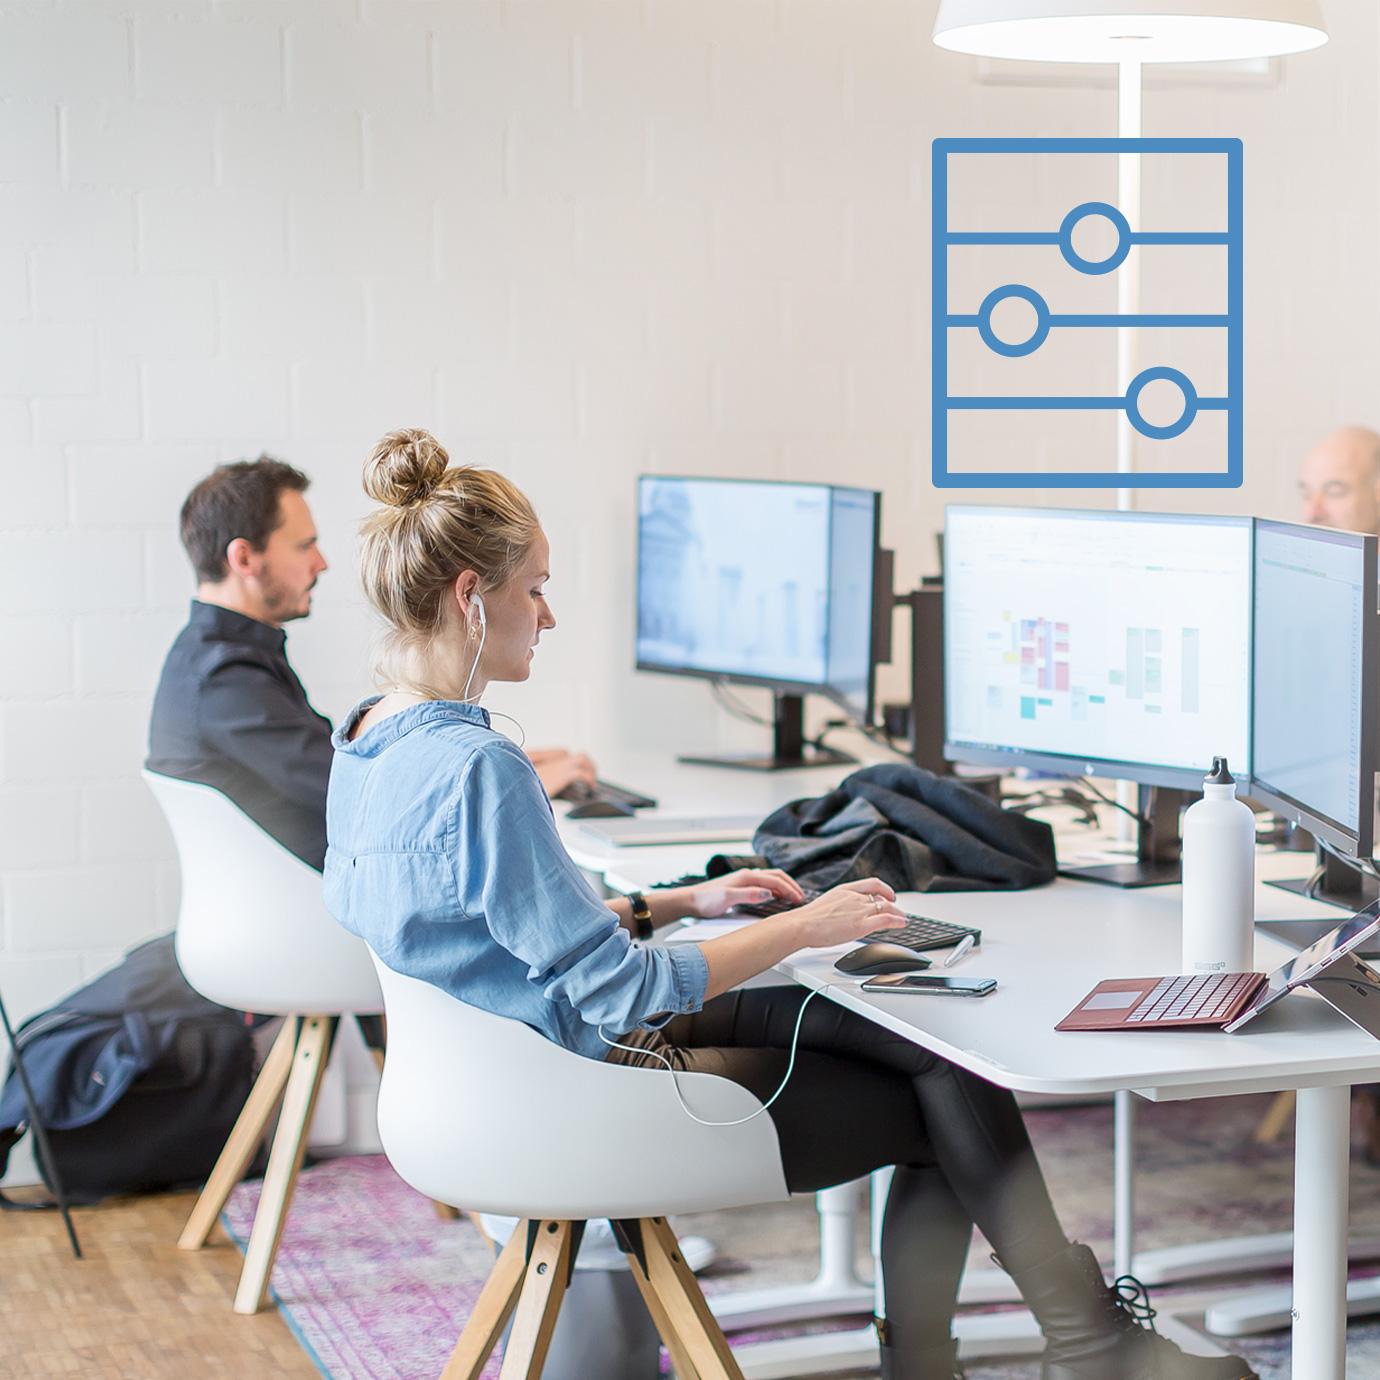 SmartIT-Security-Monitoring